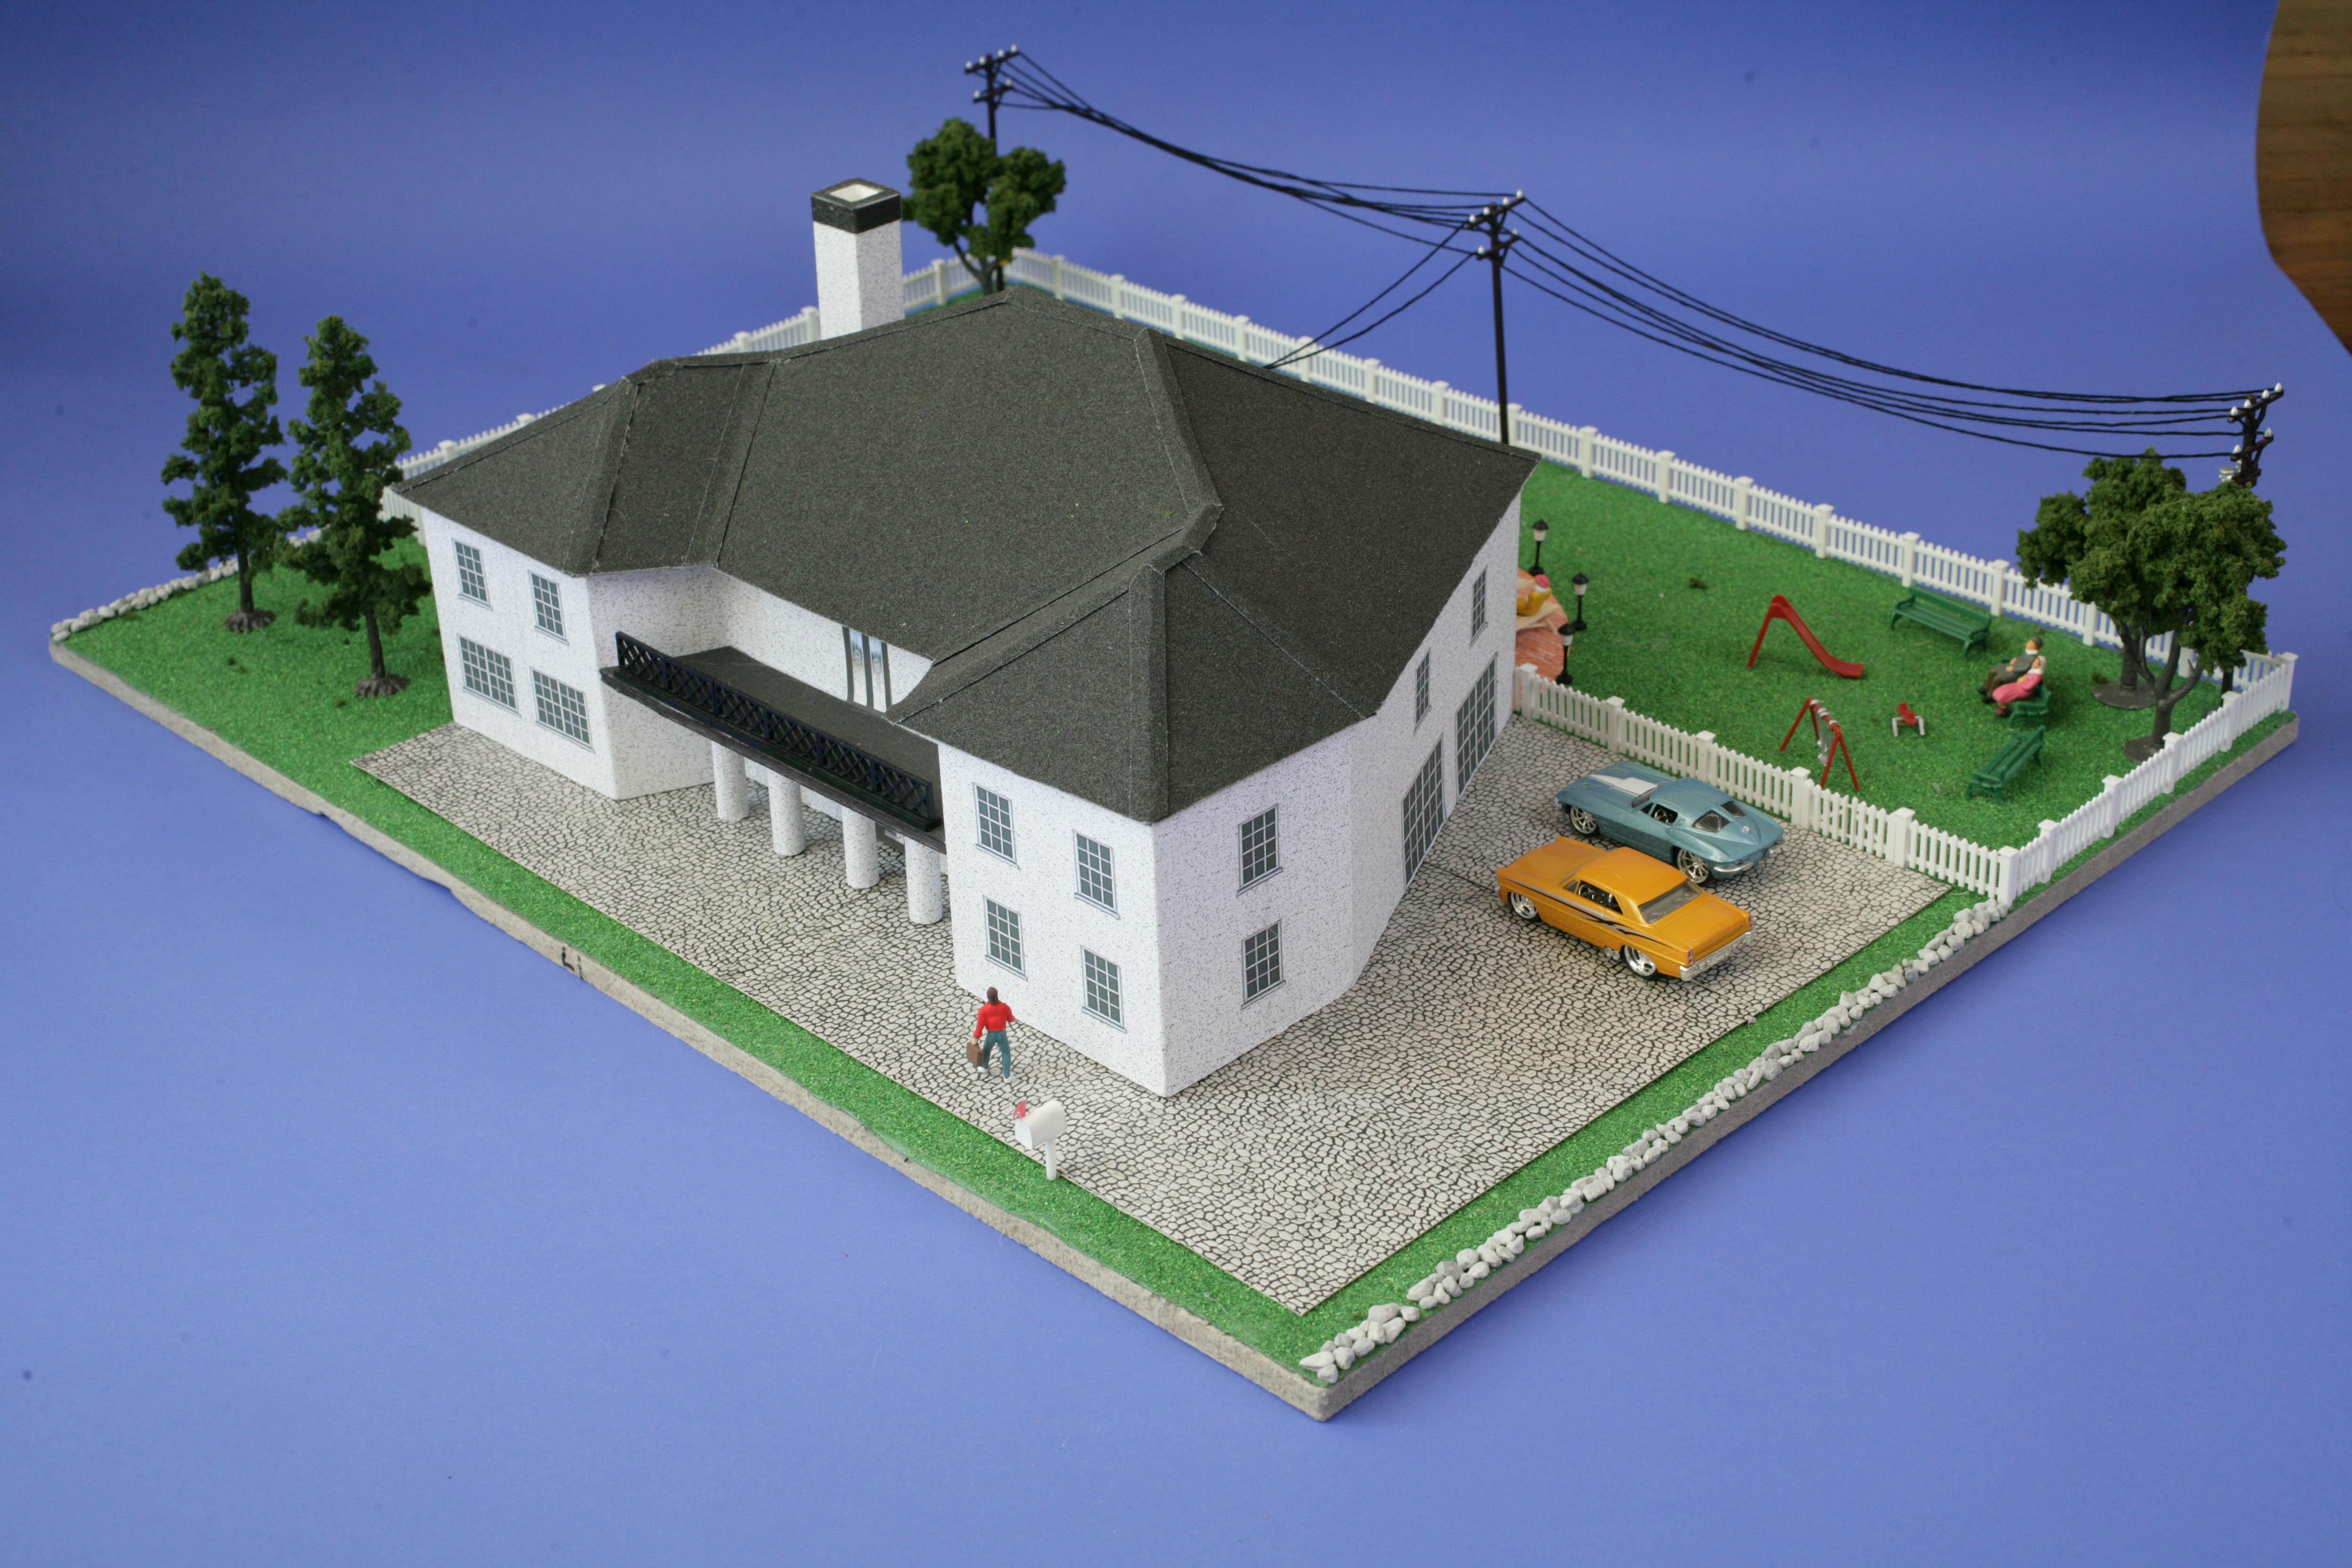 Architecture House Model the model housemichael mattana at coroflot